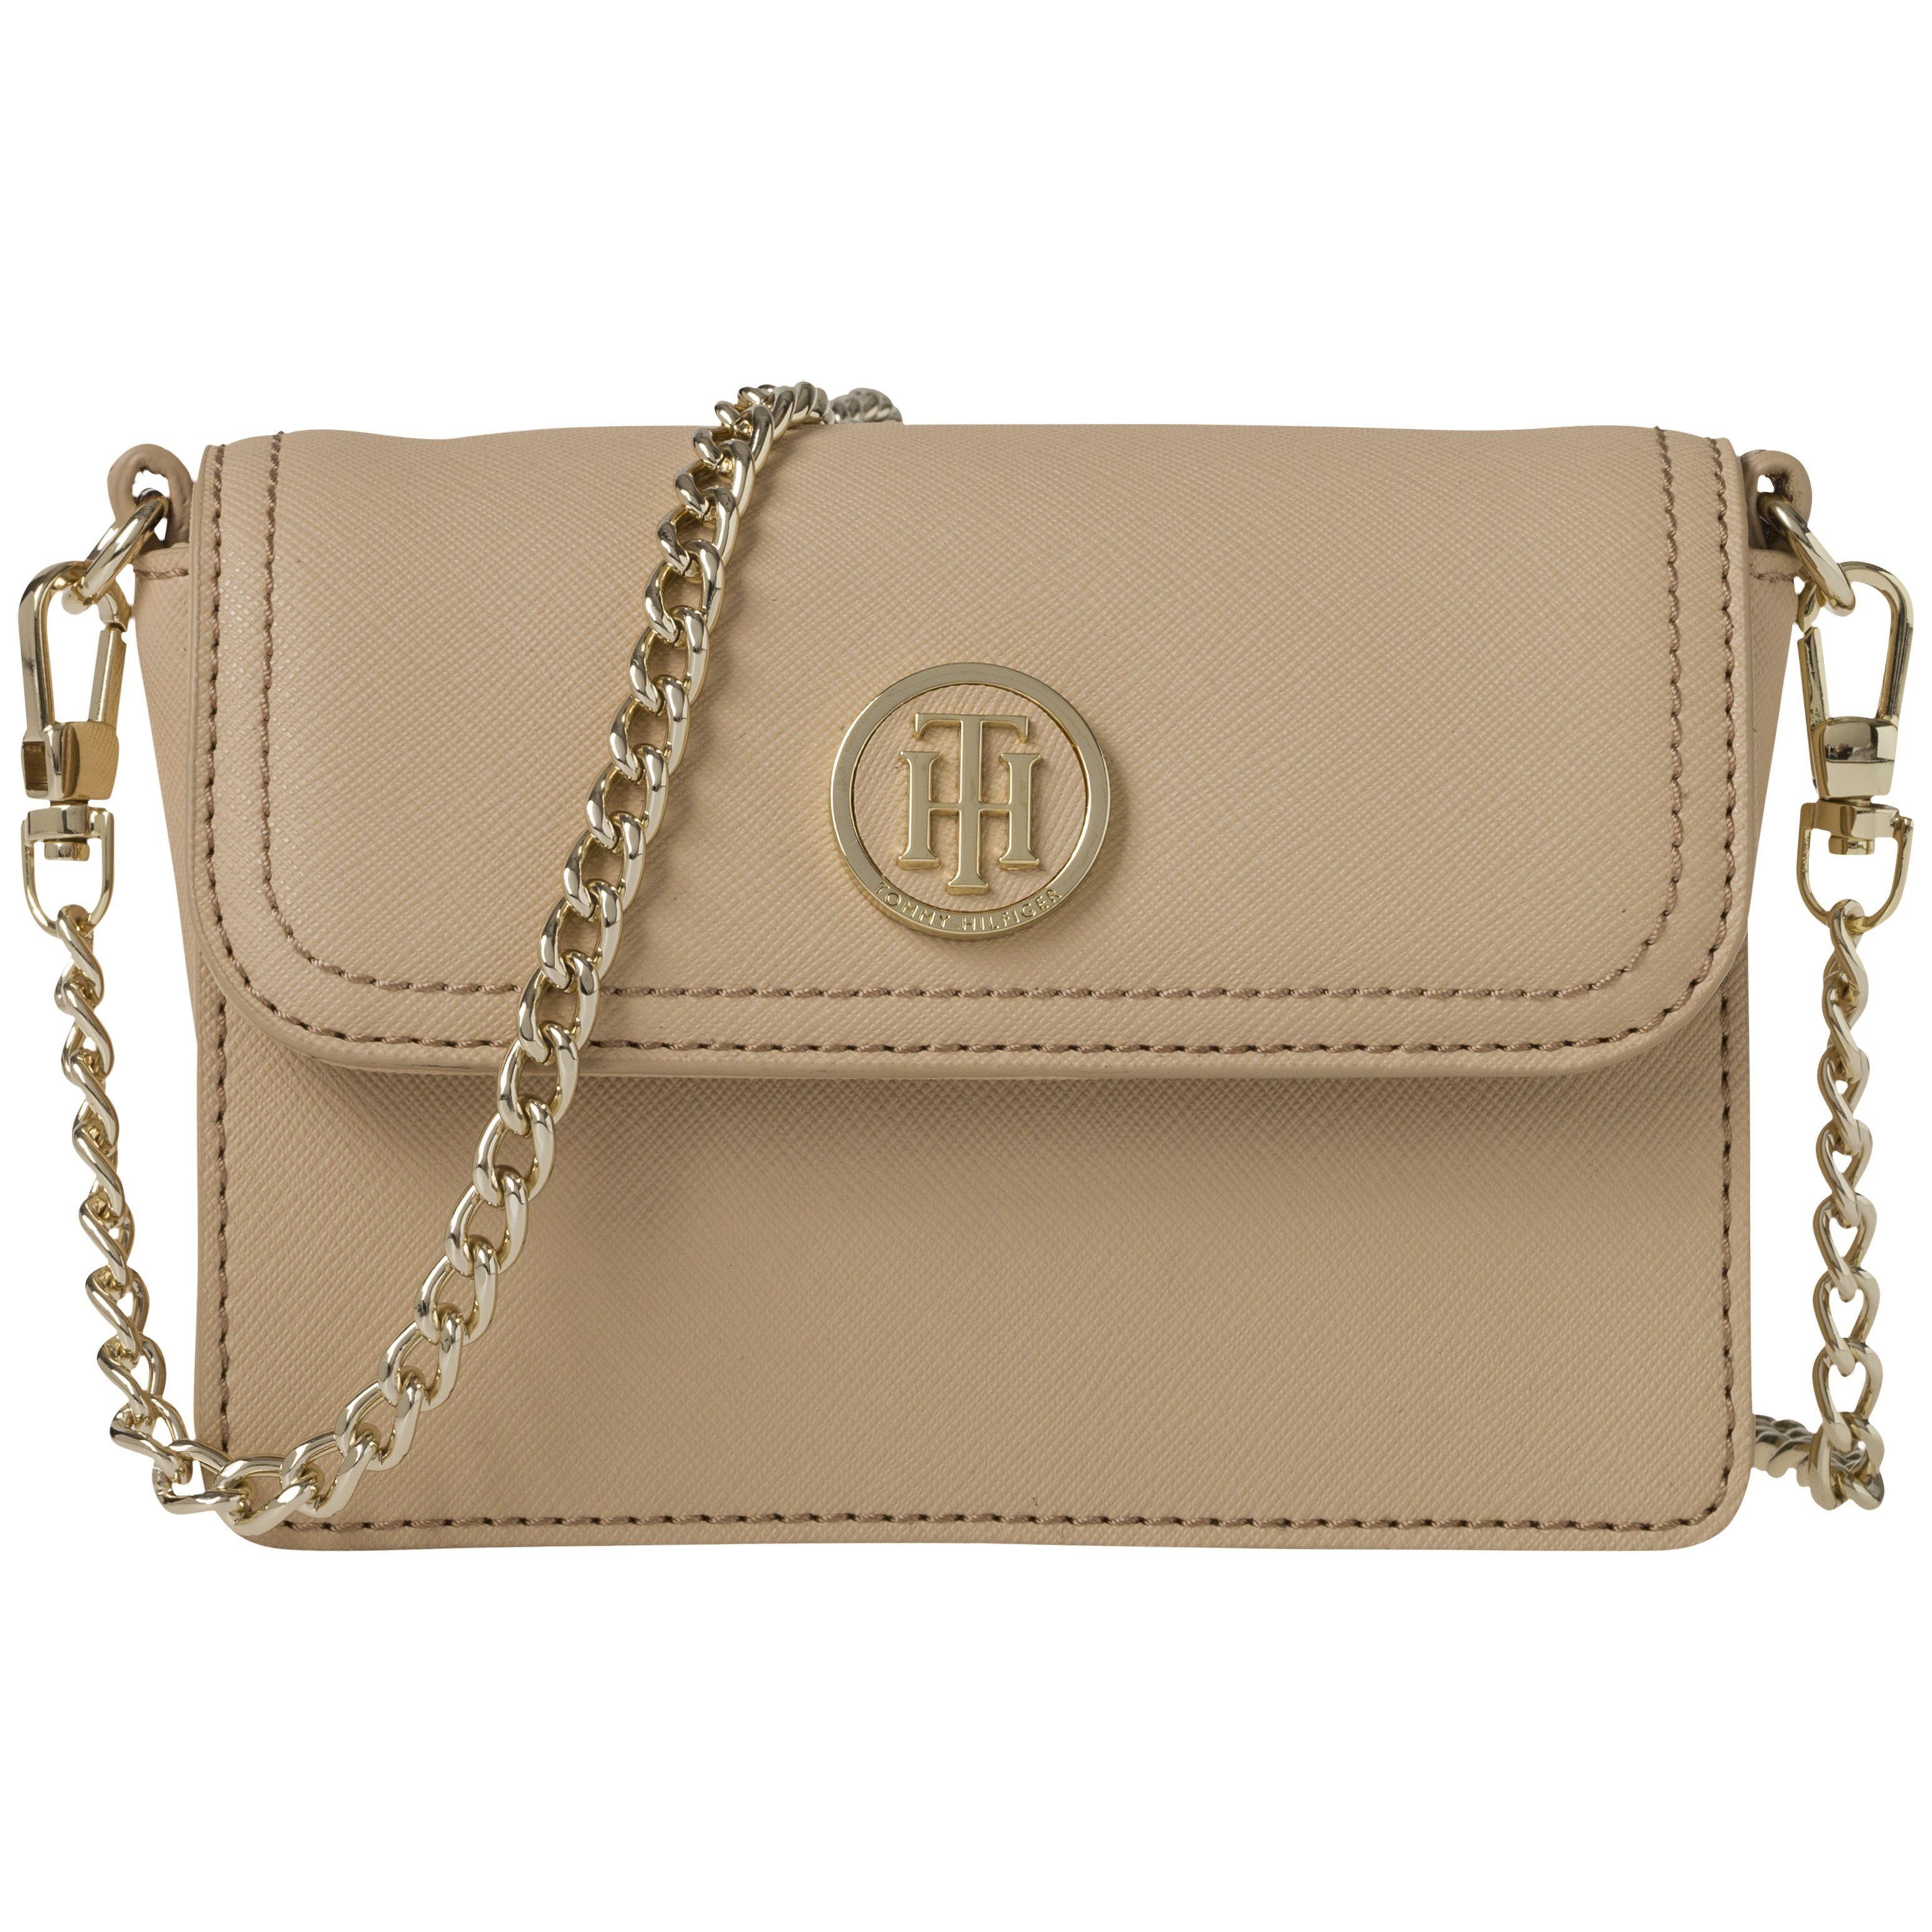 Tommy Hilfiger Handtasche »AMERICAN ICON MINI CROSSOVER SOLID« online kaufen | OTTO